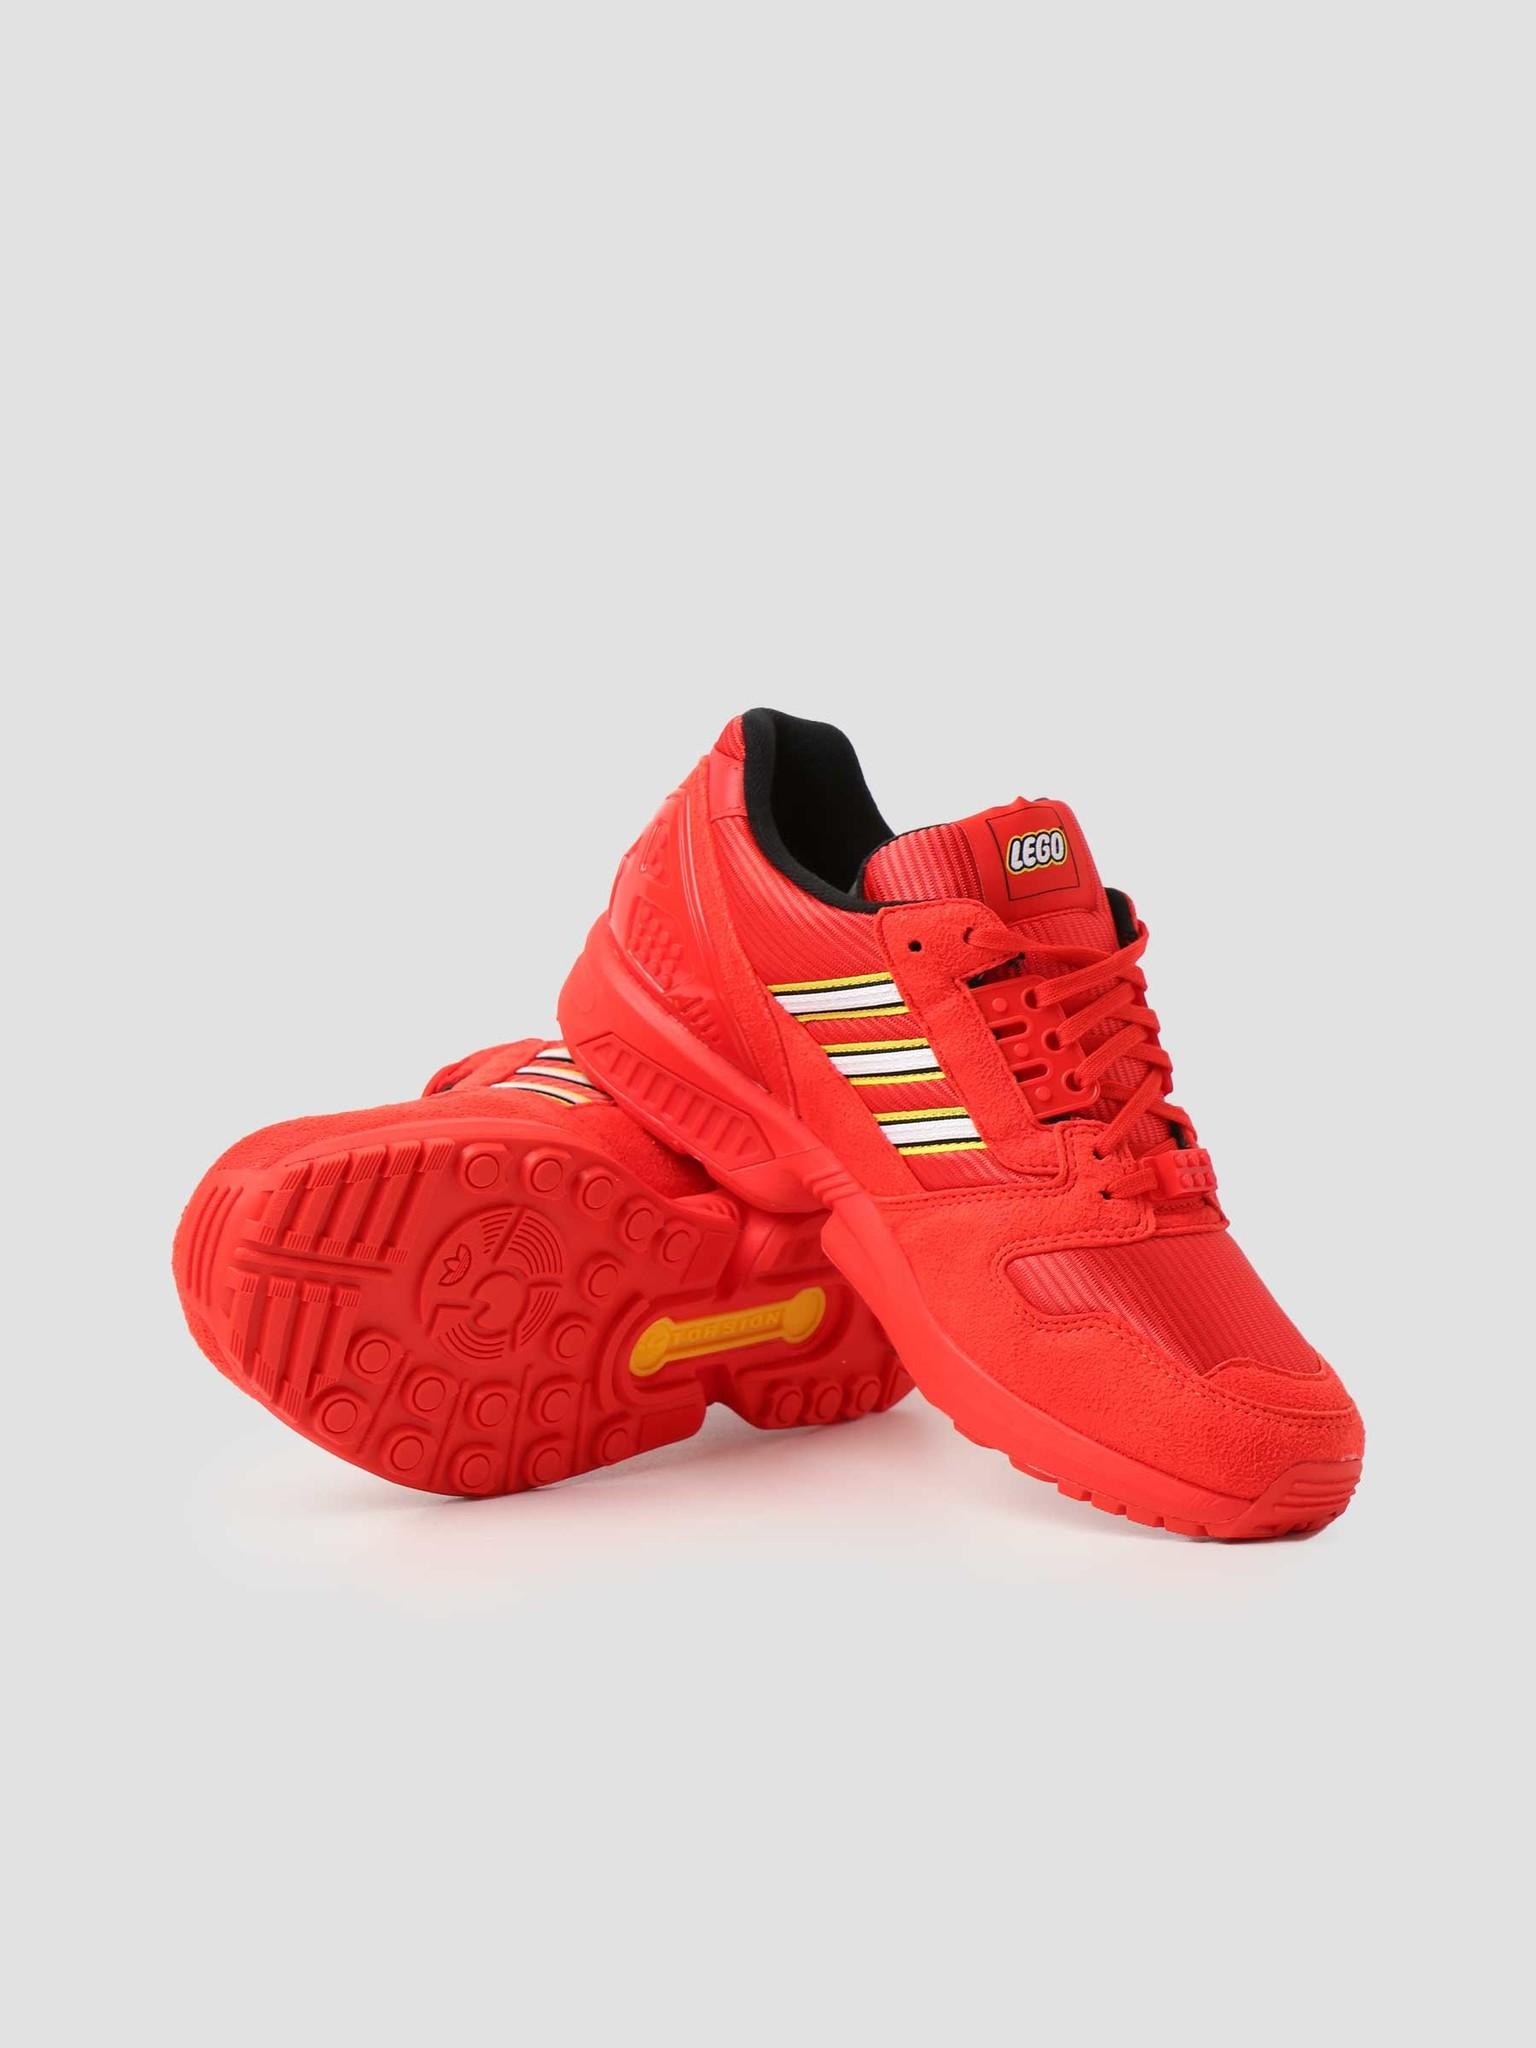 adidas adidas ZX 8000 Lego Red Footwear White Red FY7084